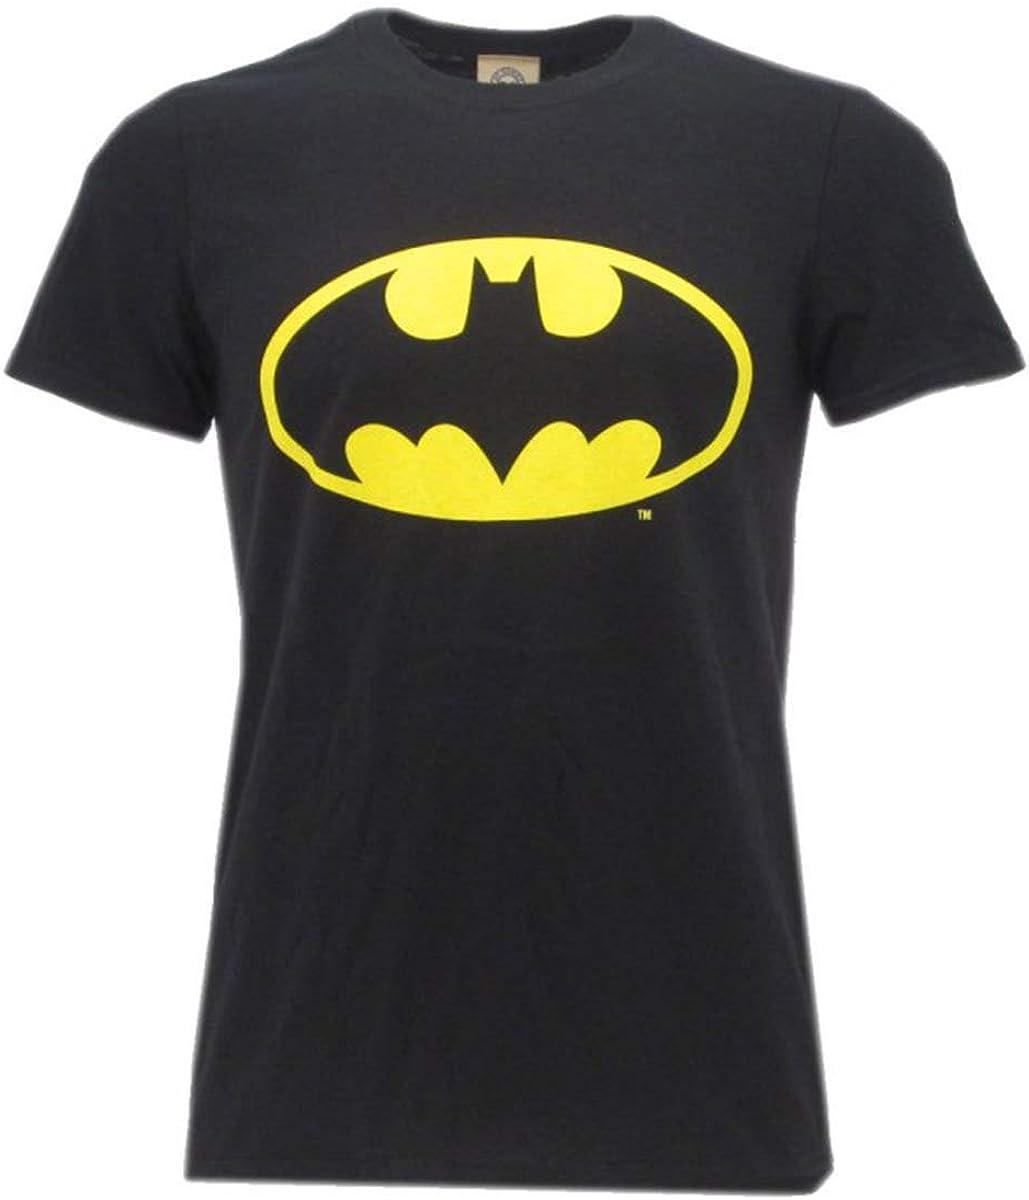 Large Ufficiale Originale Warner Bros T-Shirt Logo Batman Super Eroe DC Comics Maglia Maglietta